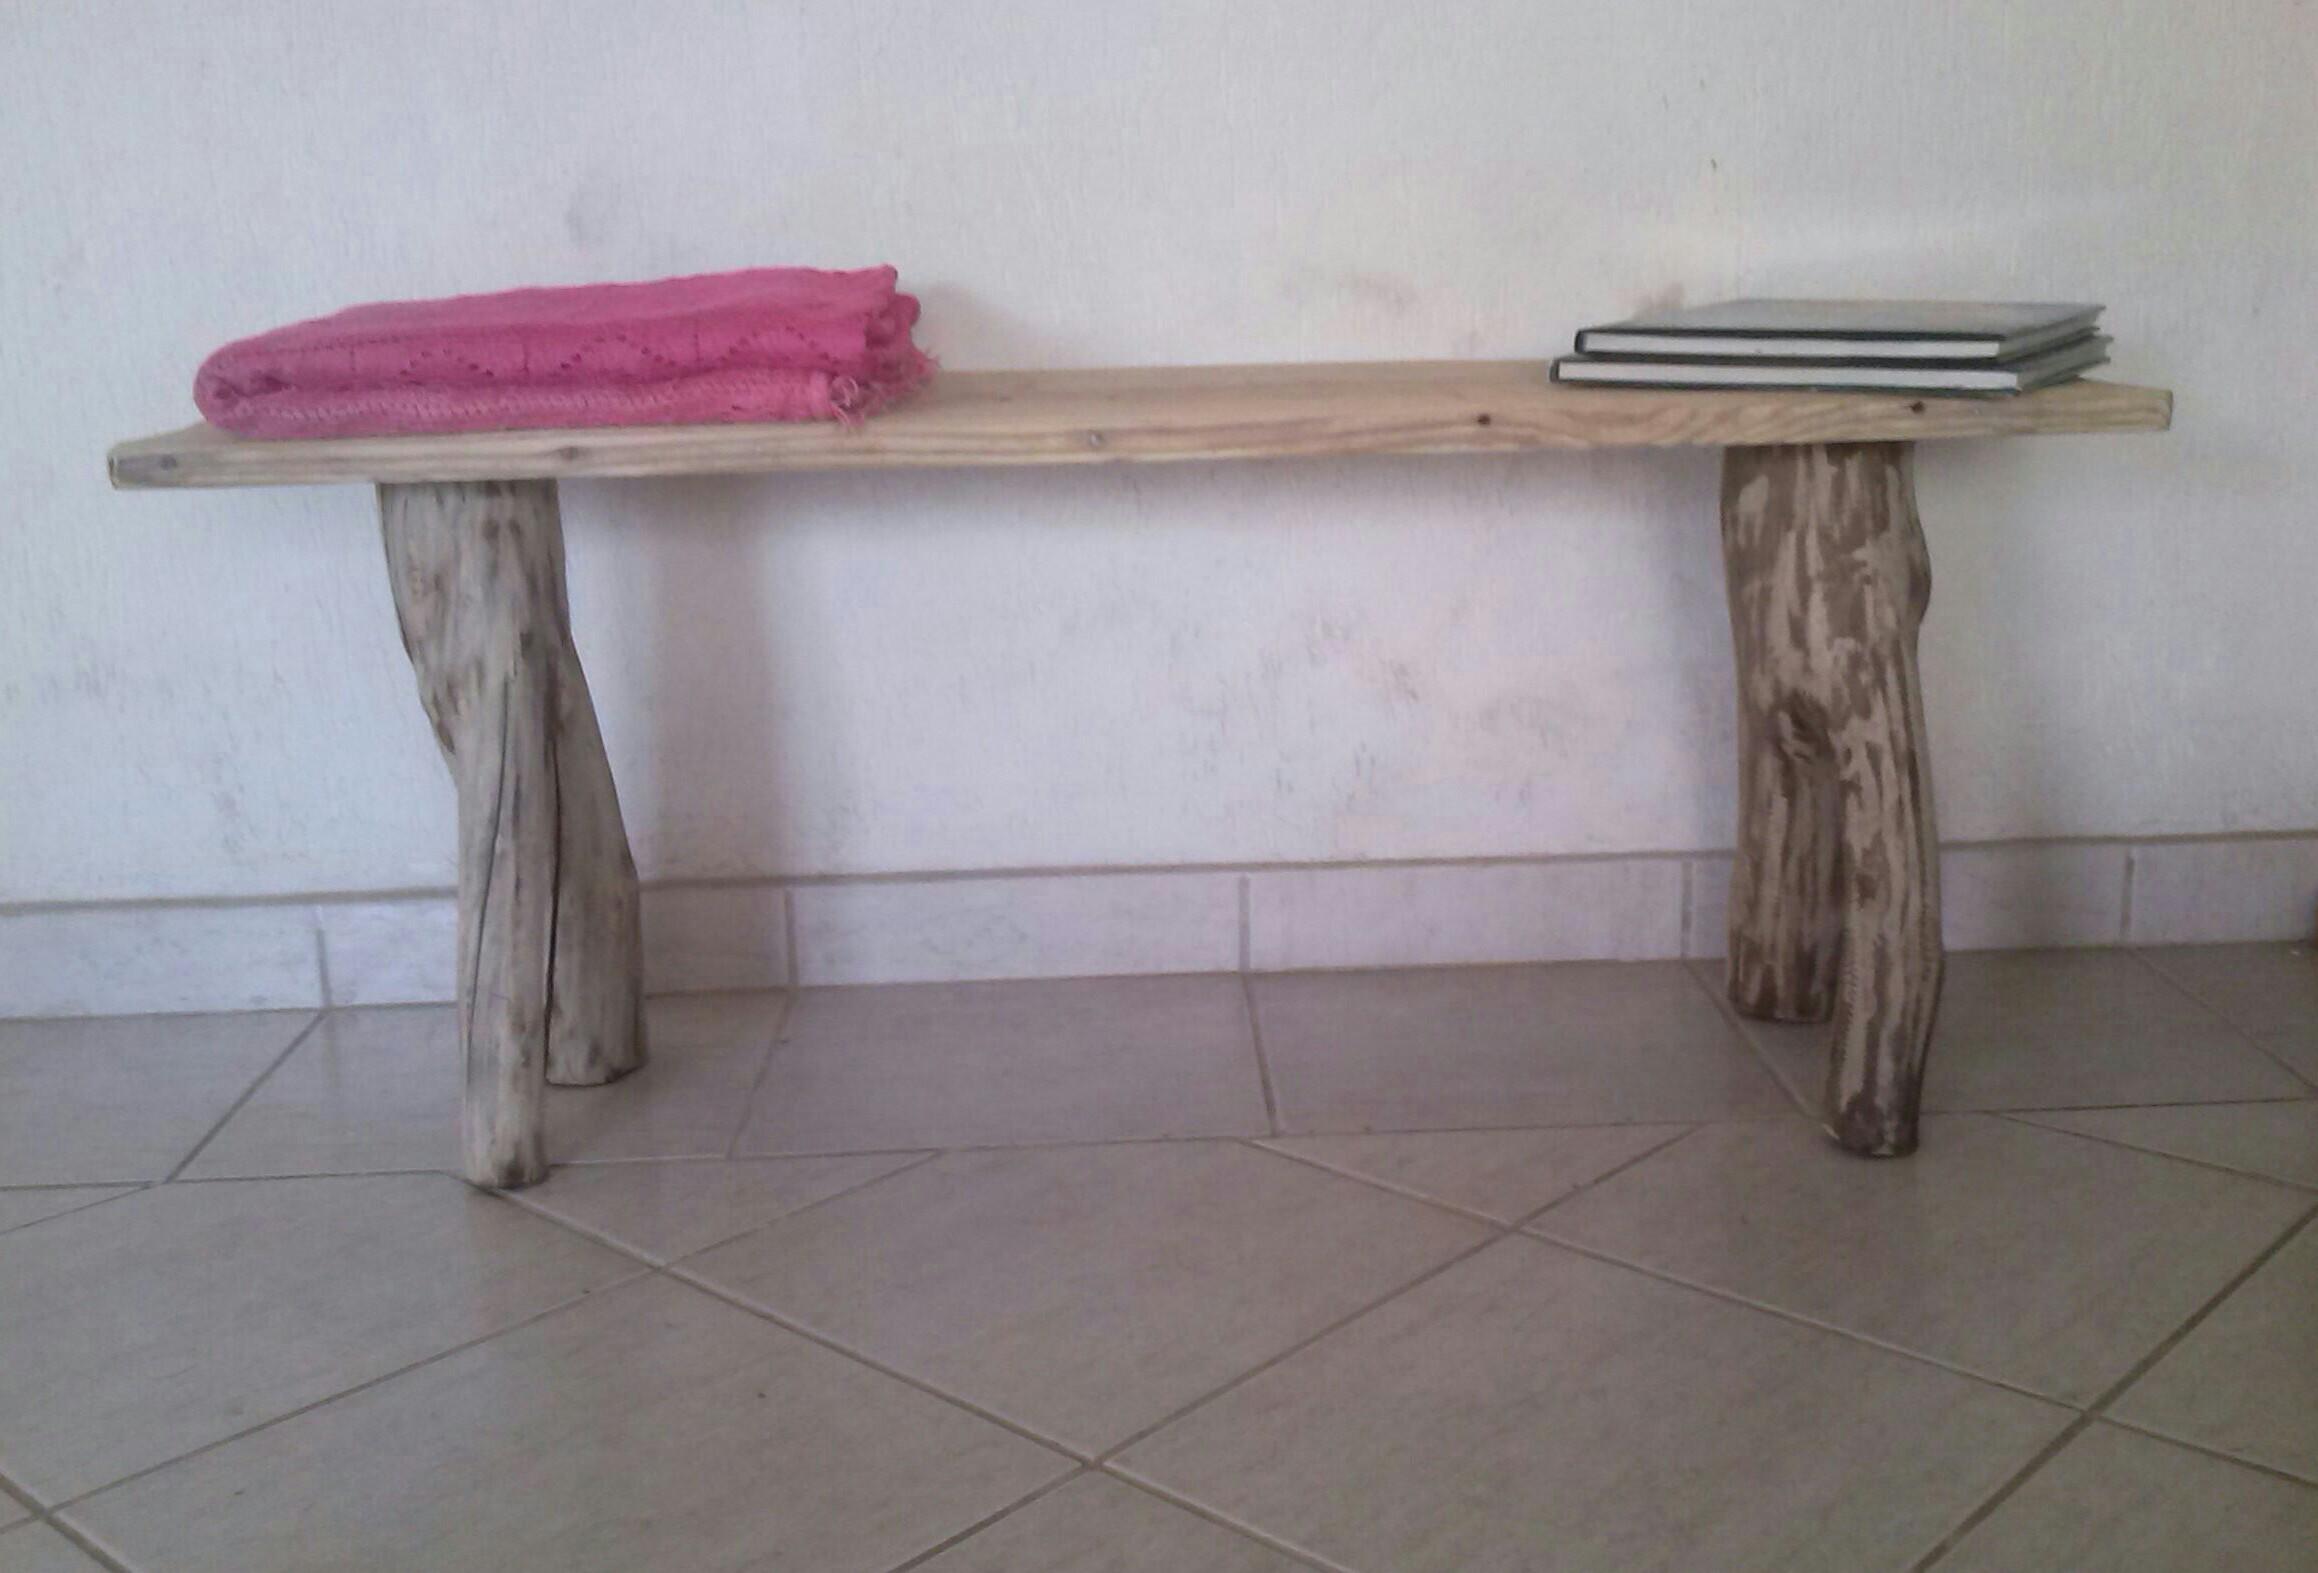 de madeira reaproveitada banco banco rustico de madeira reaproveitada  #894262 2318x1573